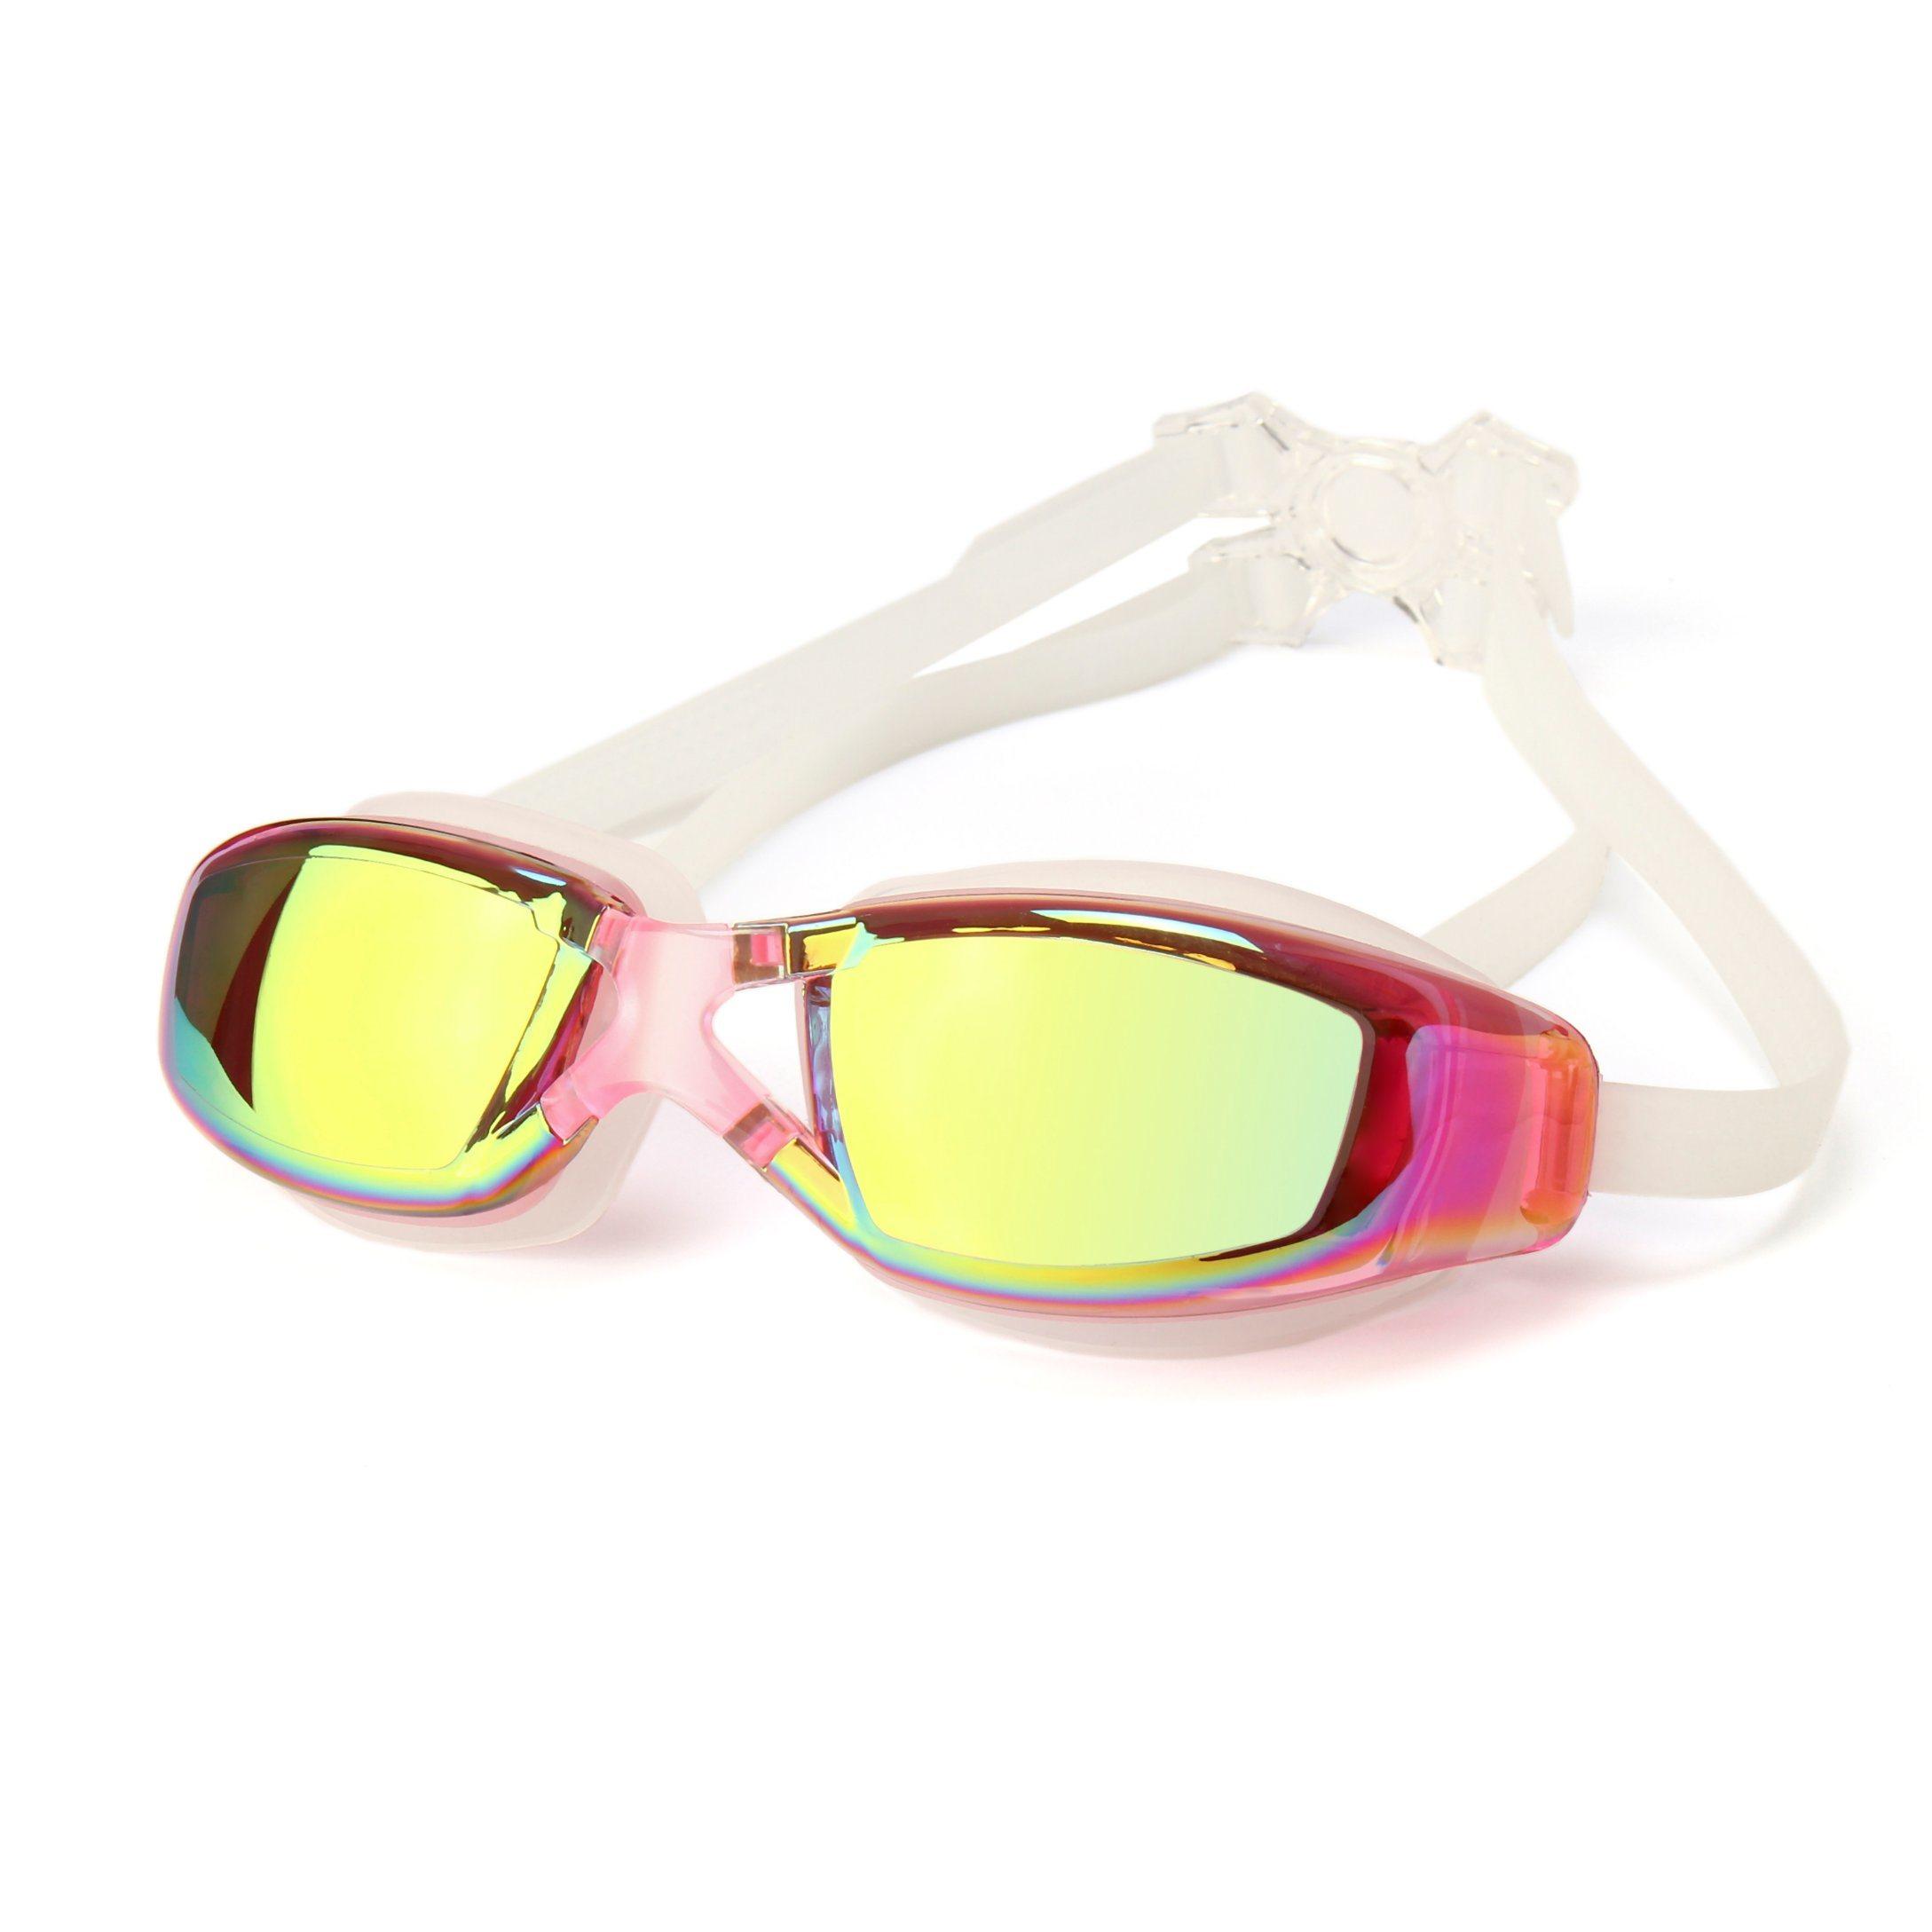 Waterproof Professional Anti-fog Glasses UV Protection HD Swimming Goggles New